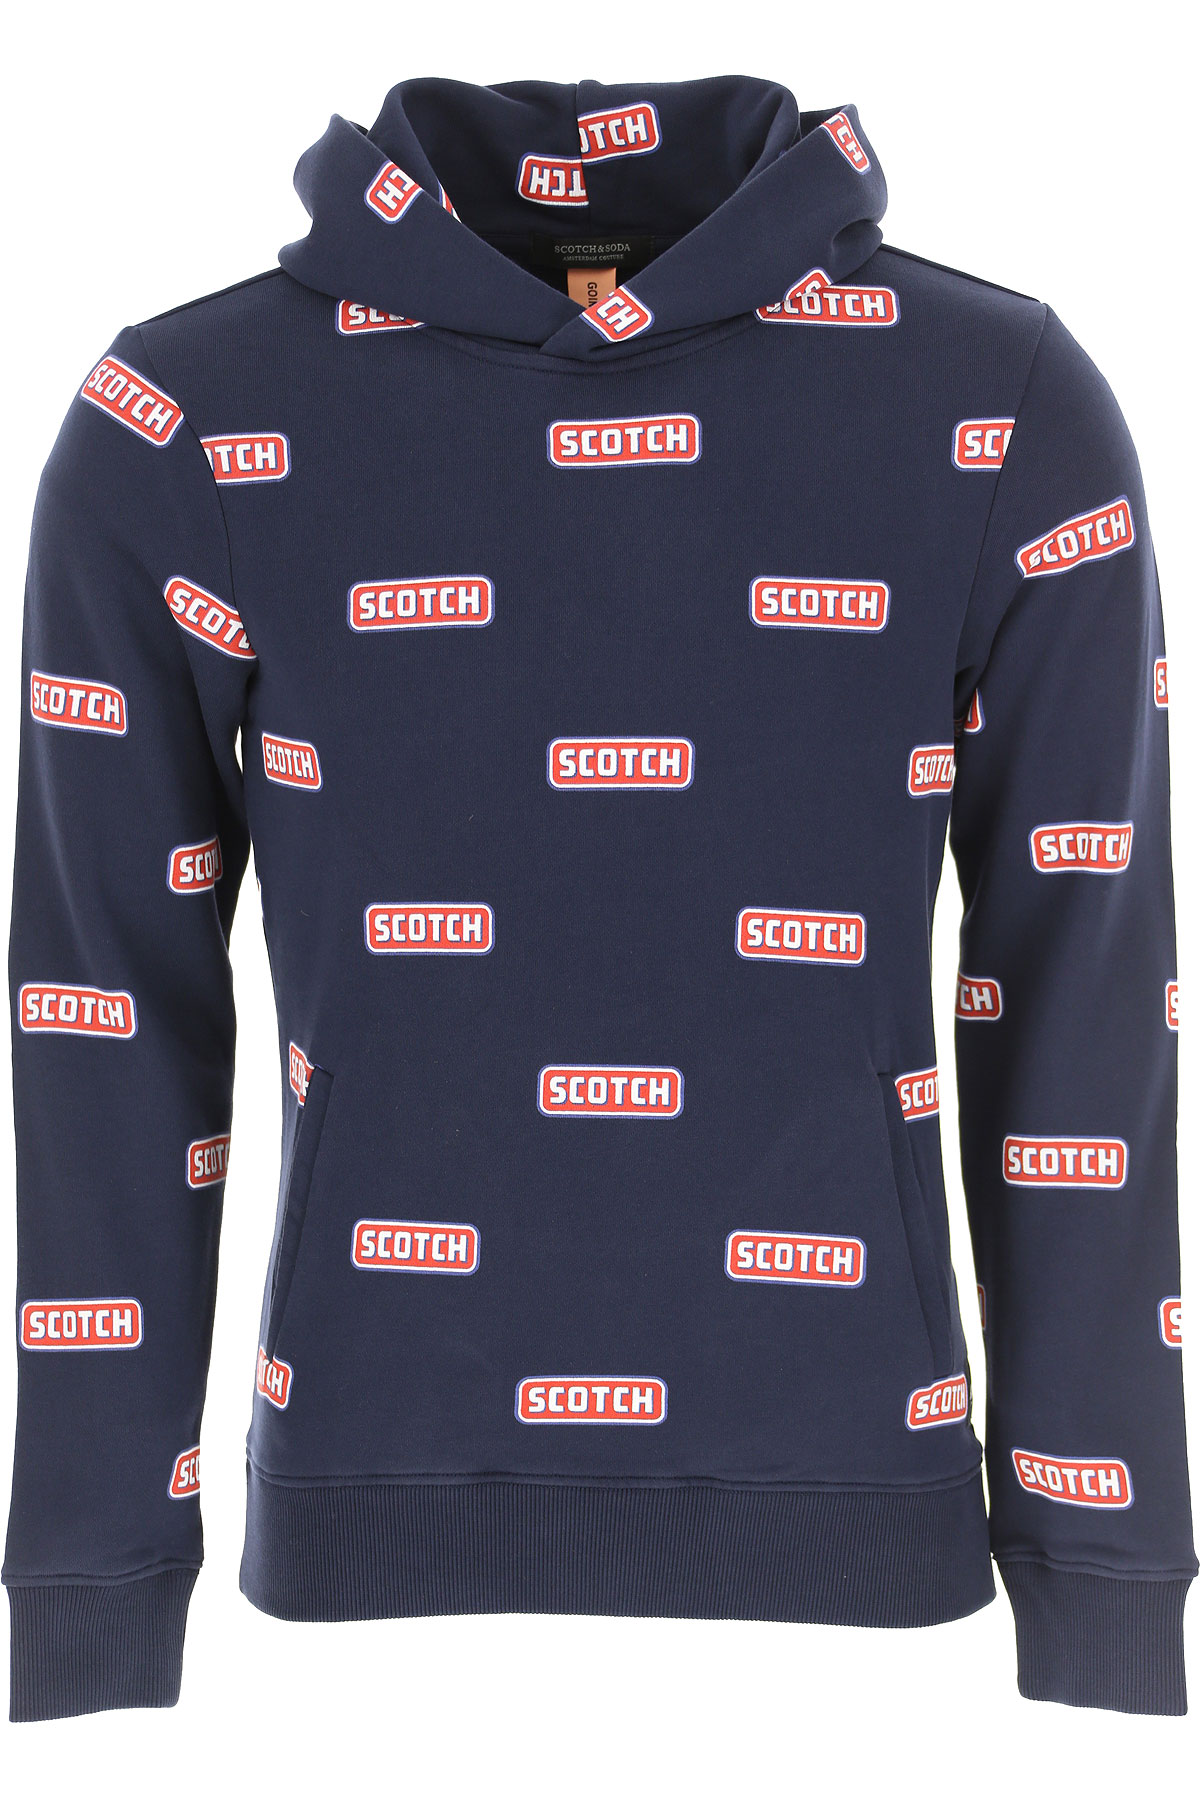 Scotch & Soda Sweatshirt for Men On Sale, Dark Blue, Cotton, 2019, L M S XL